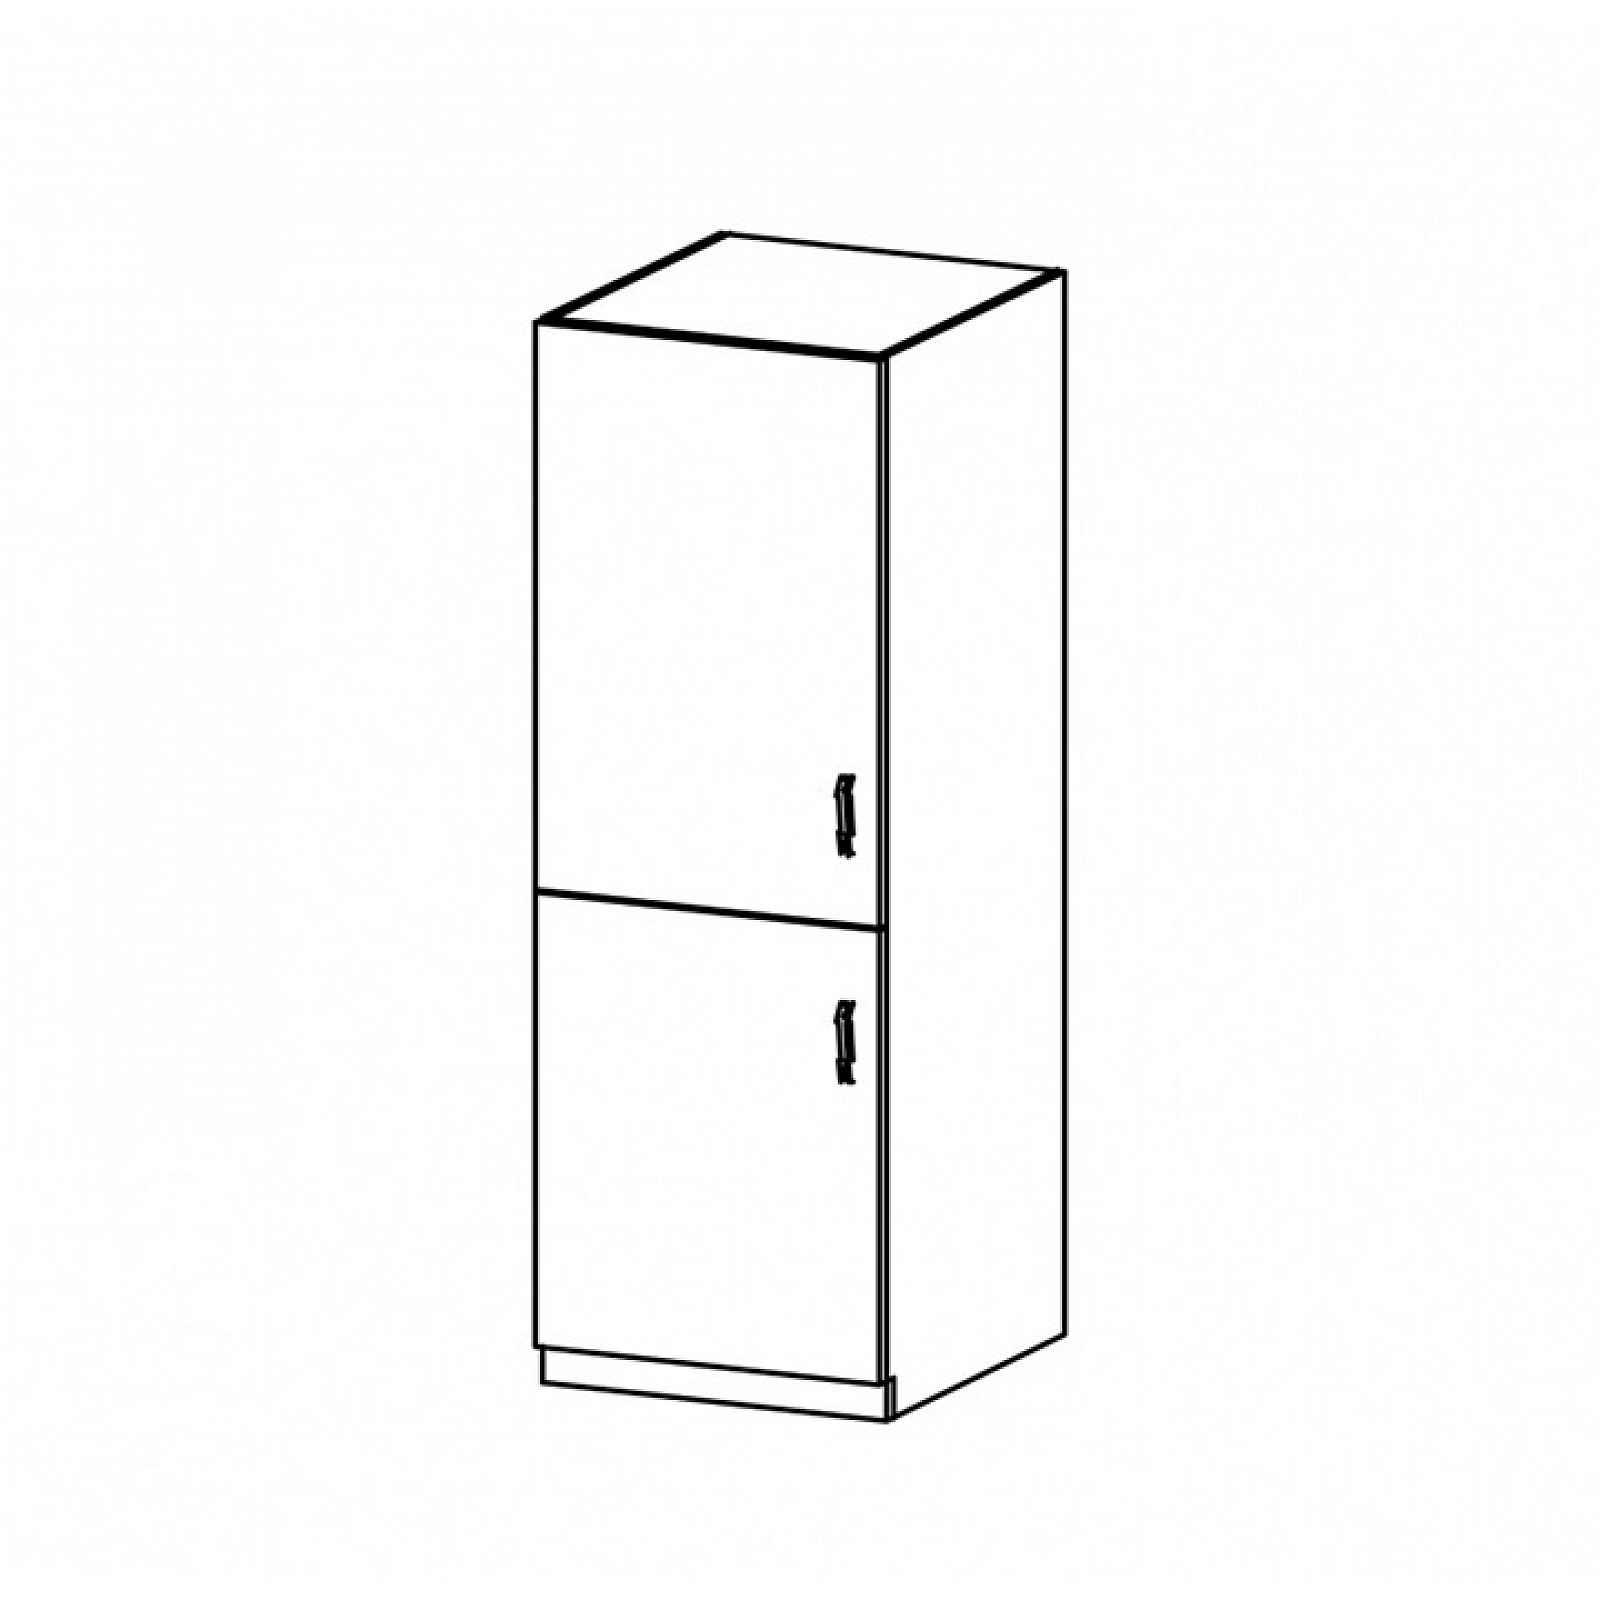 Vysoká skříňka PROVANCE D60R bílá / sosna andersen Tempo Kondela Levé